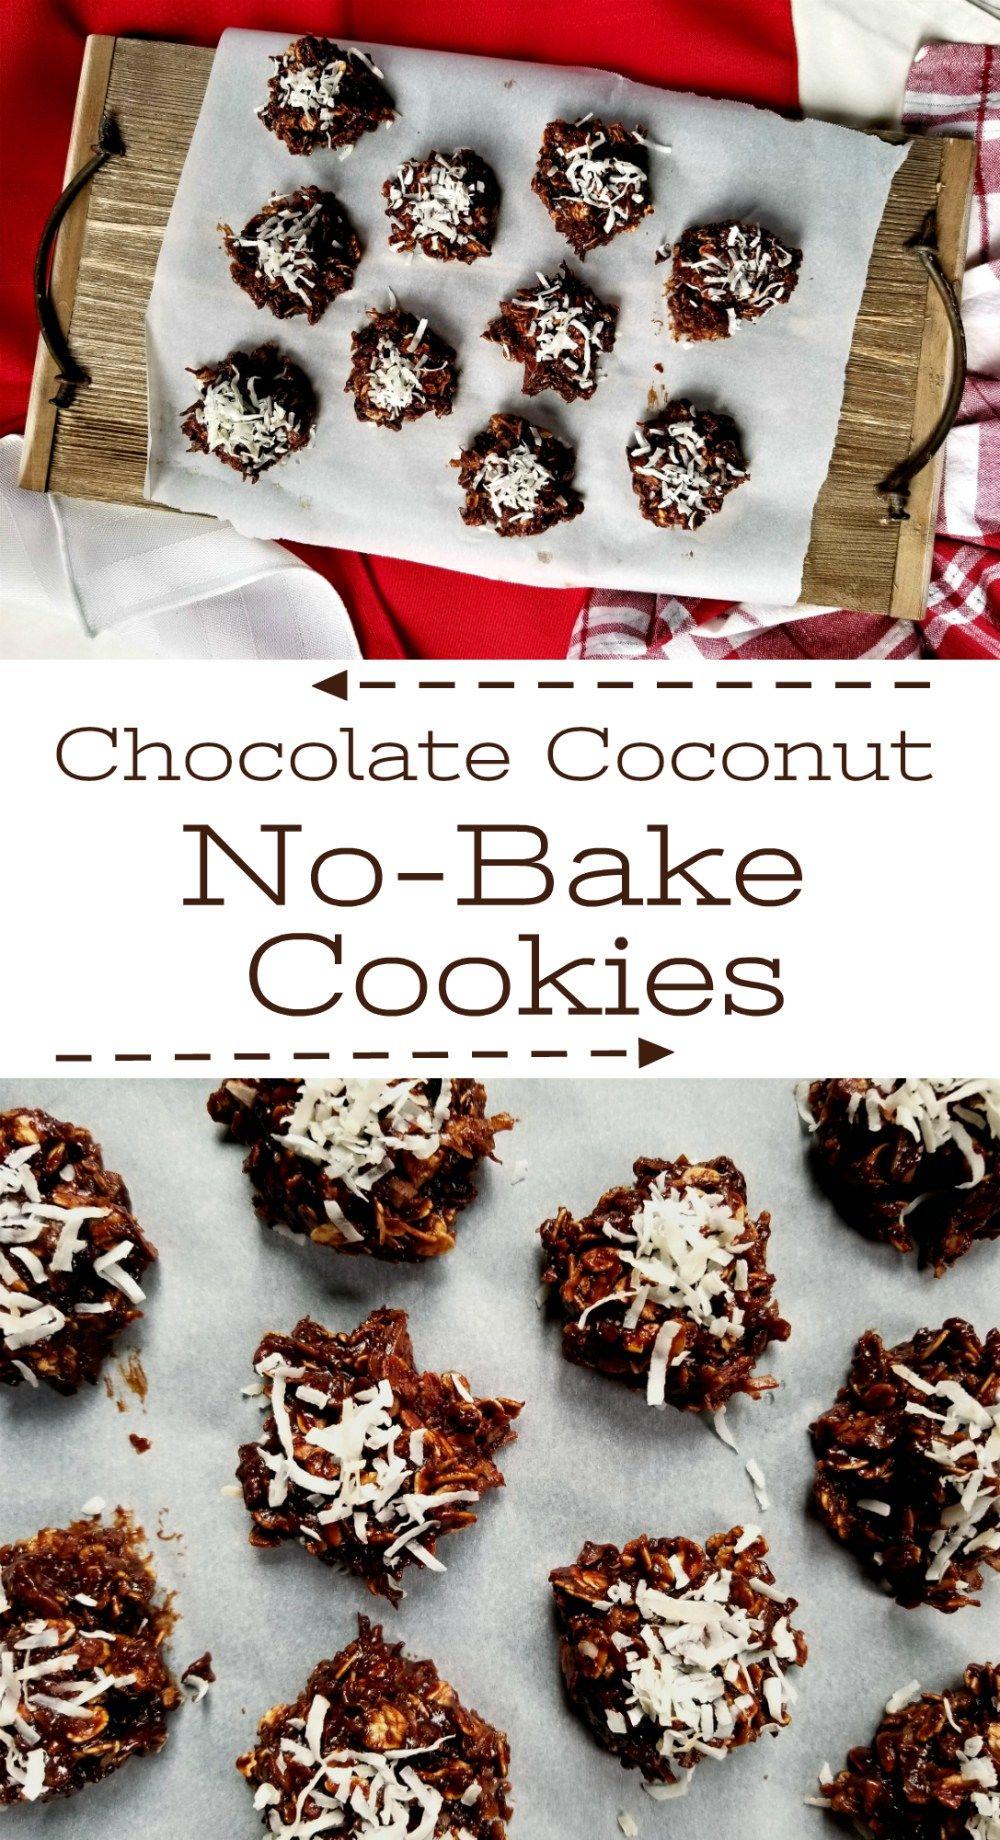 Chocolate Coconut NoBake Cookies Recipe Chocolate